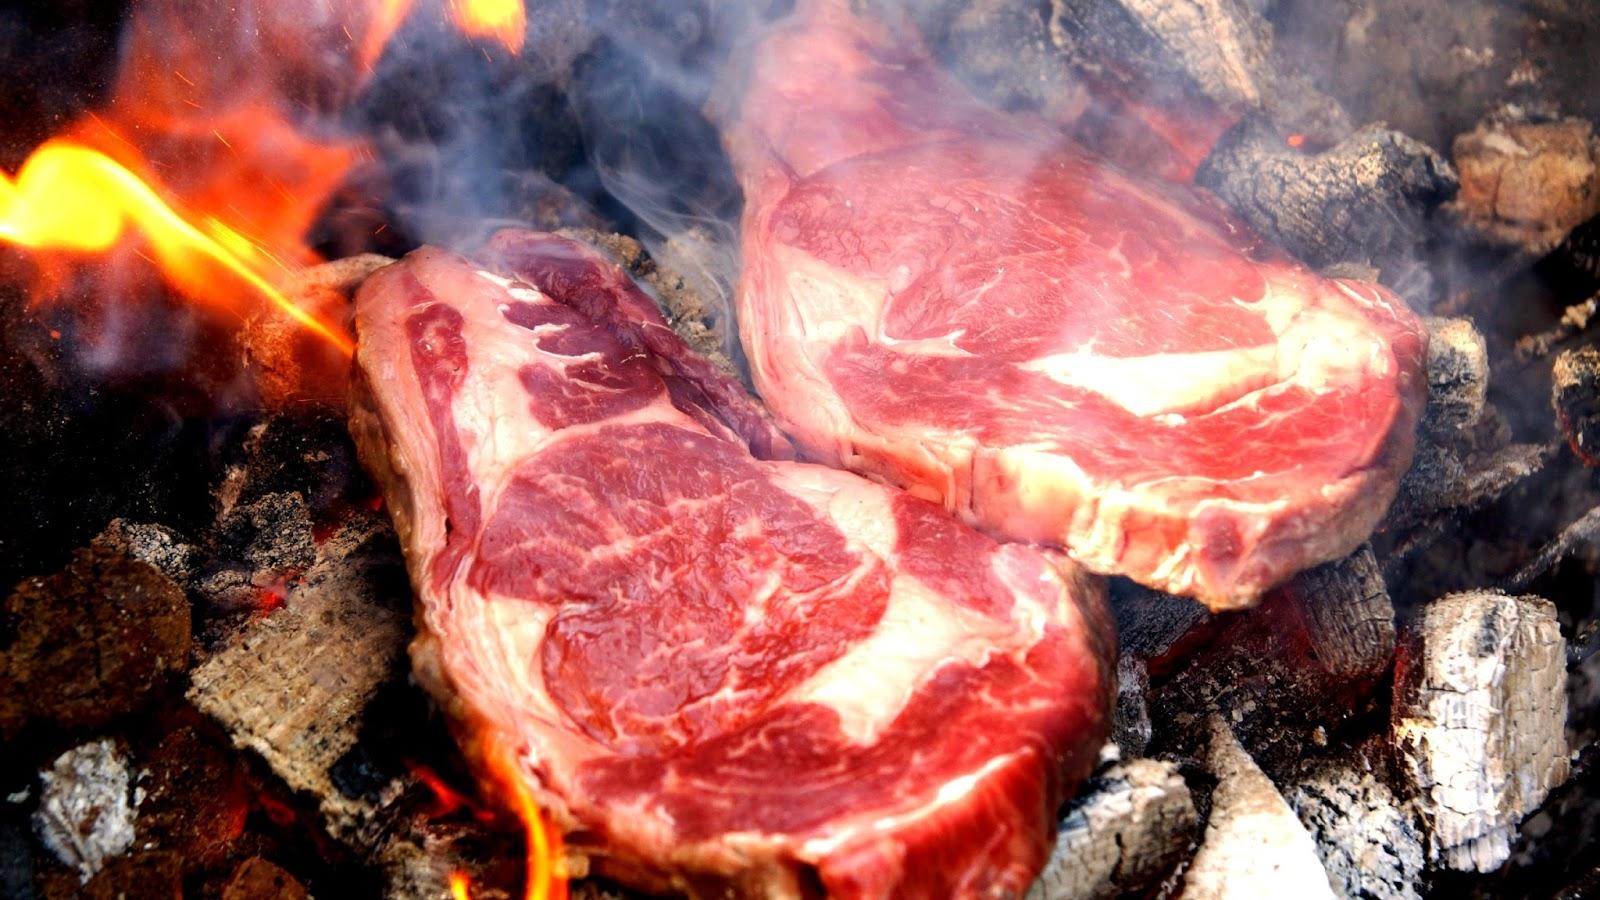 caveman steak